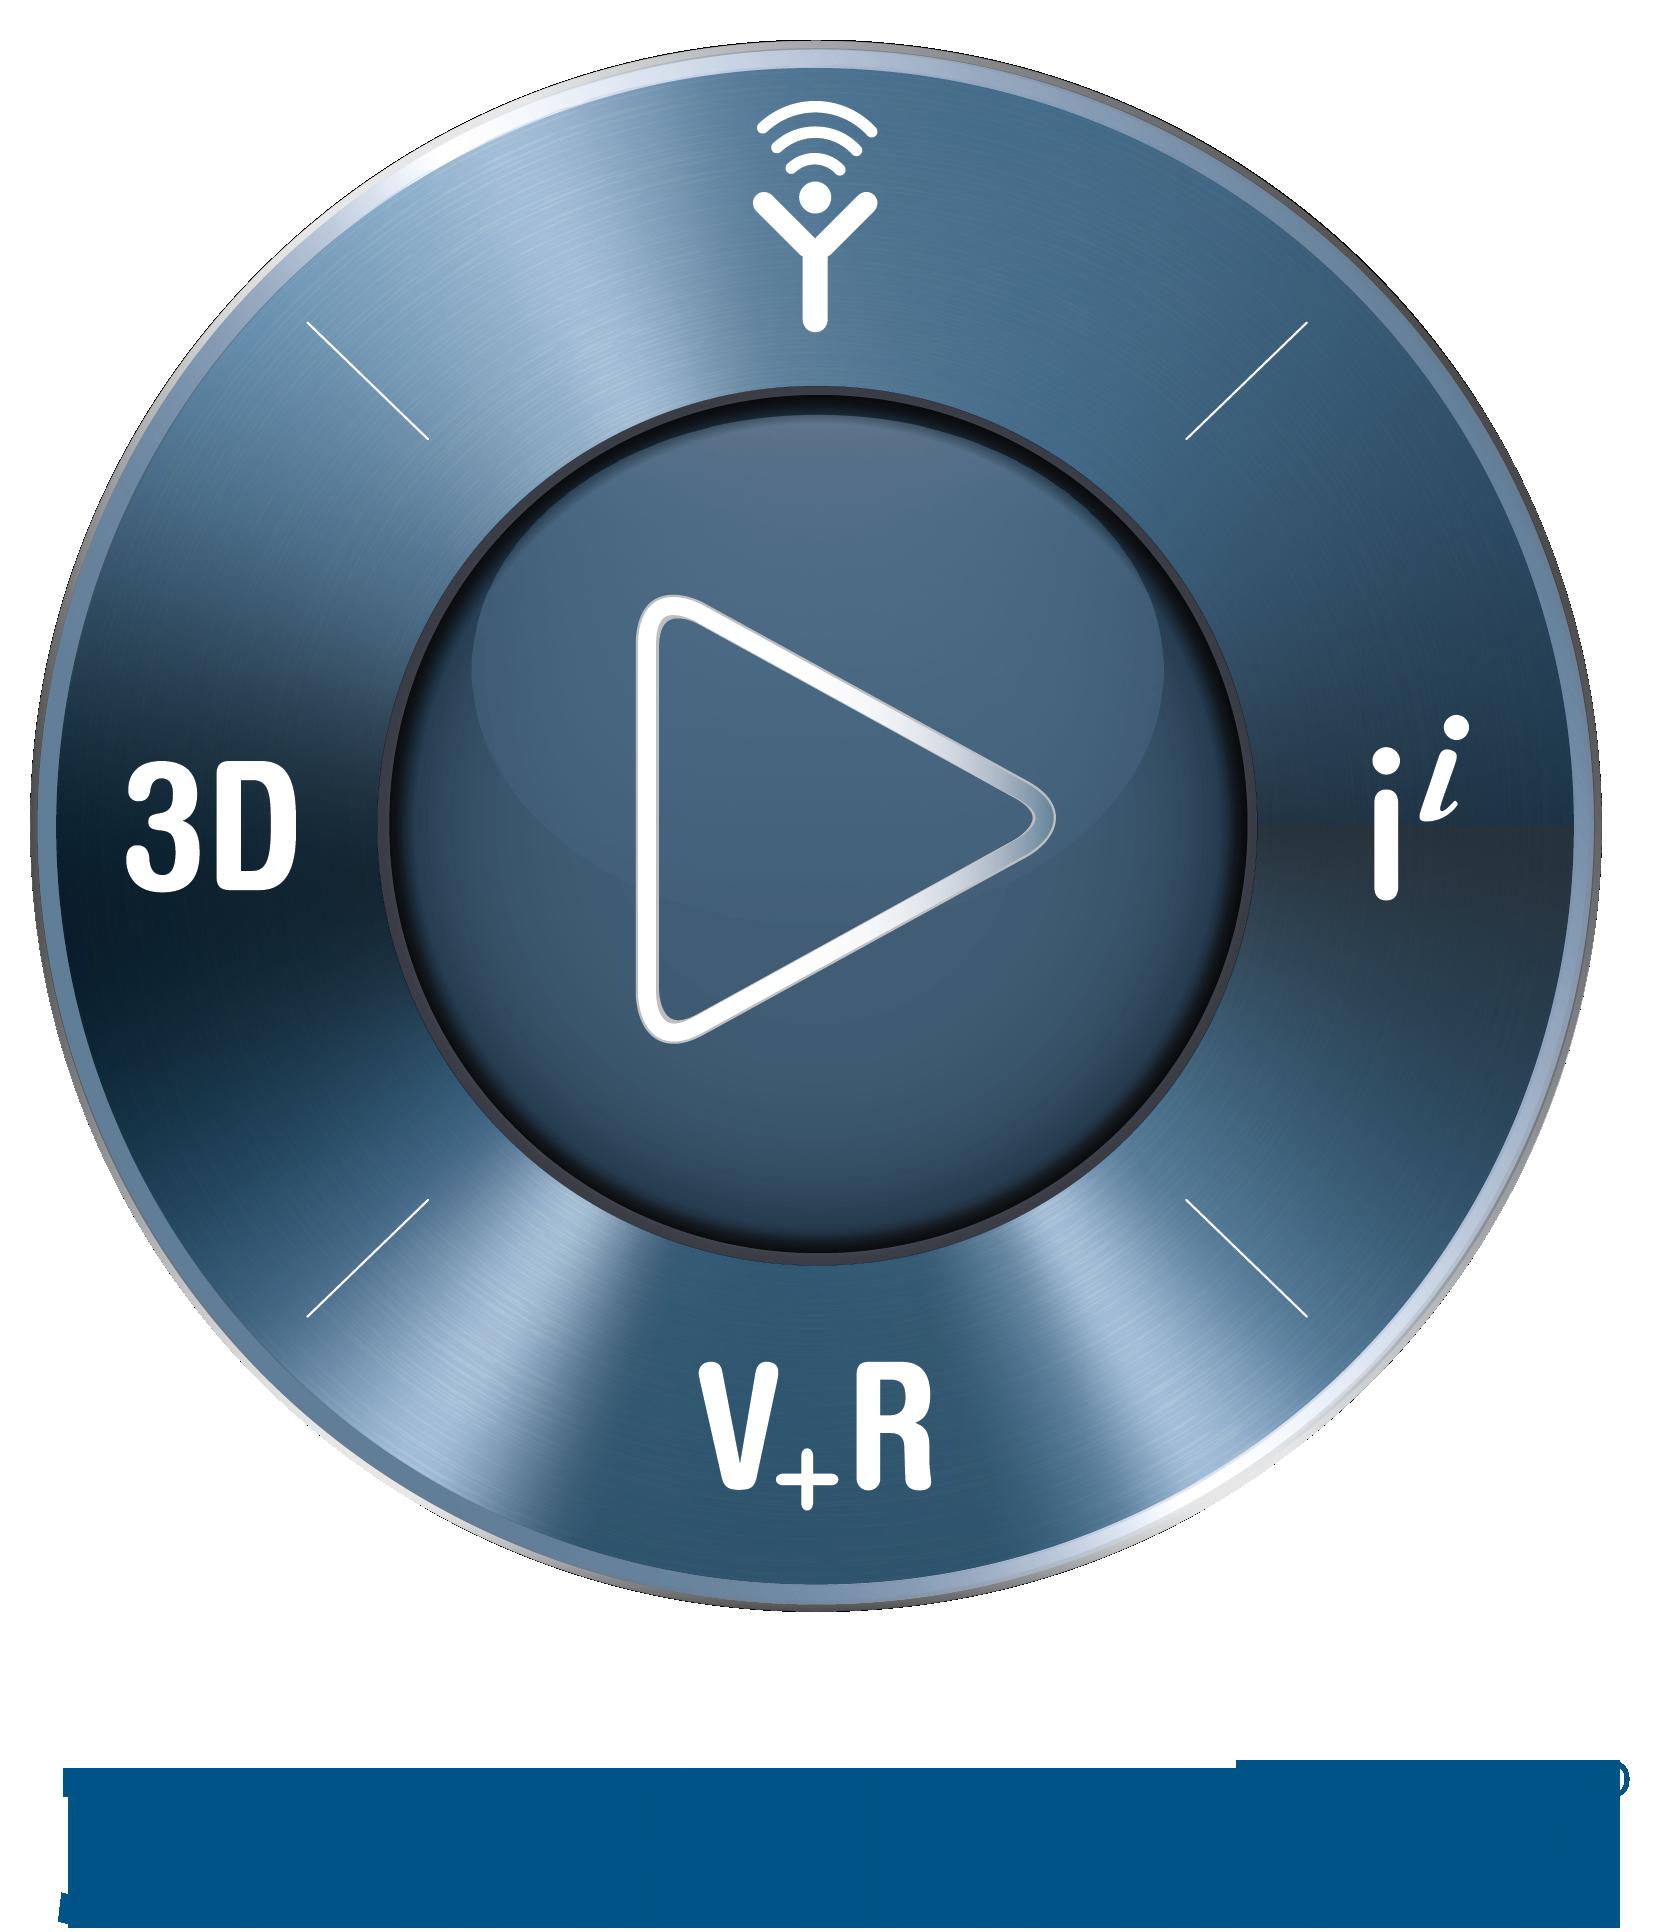 Dassault Systèmes 3DExperience Kompass